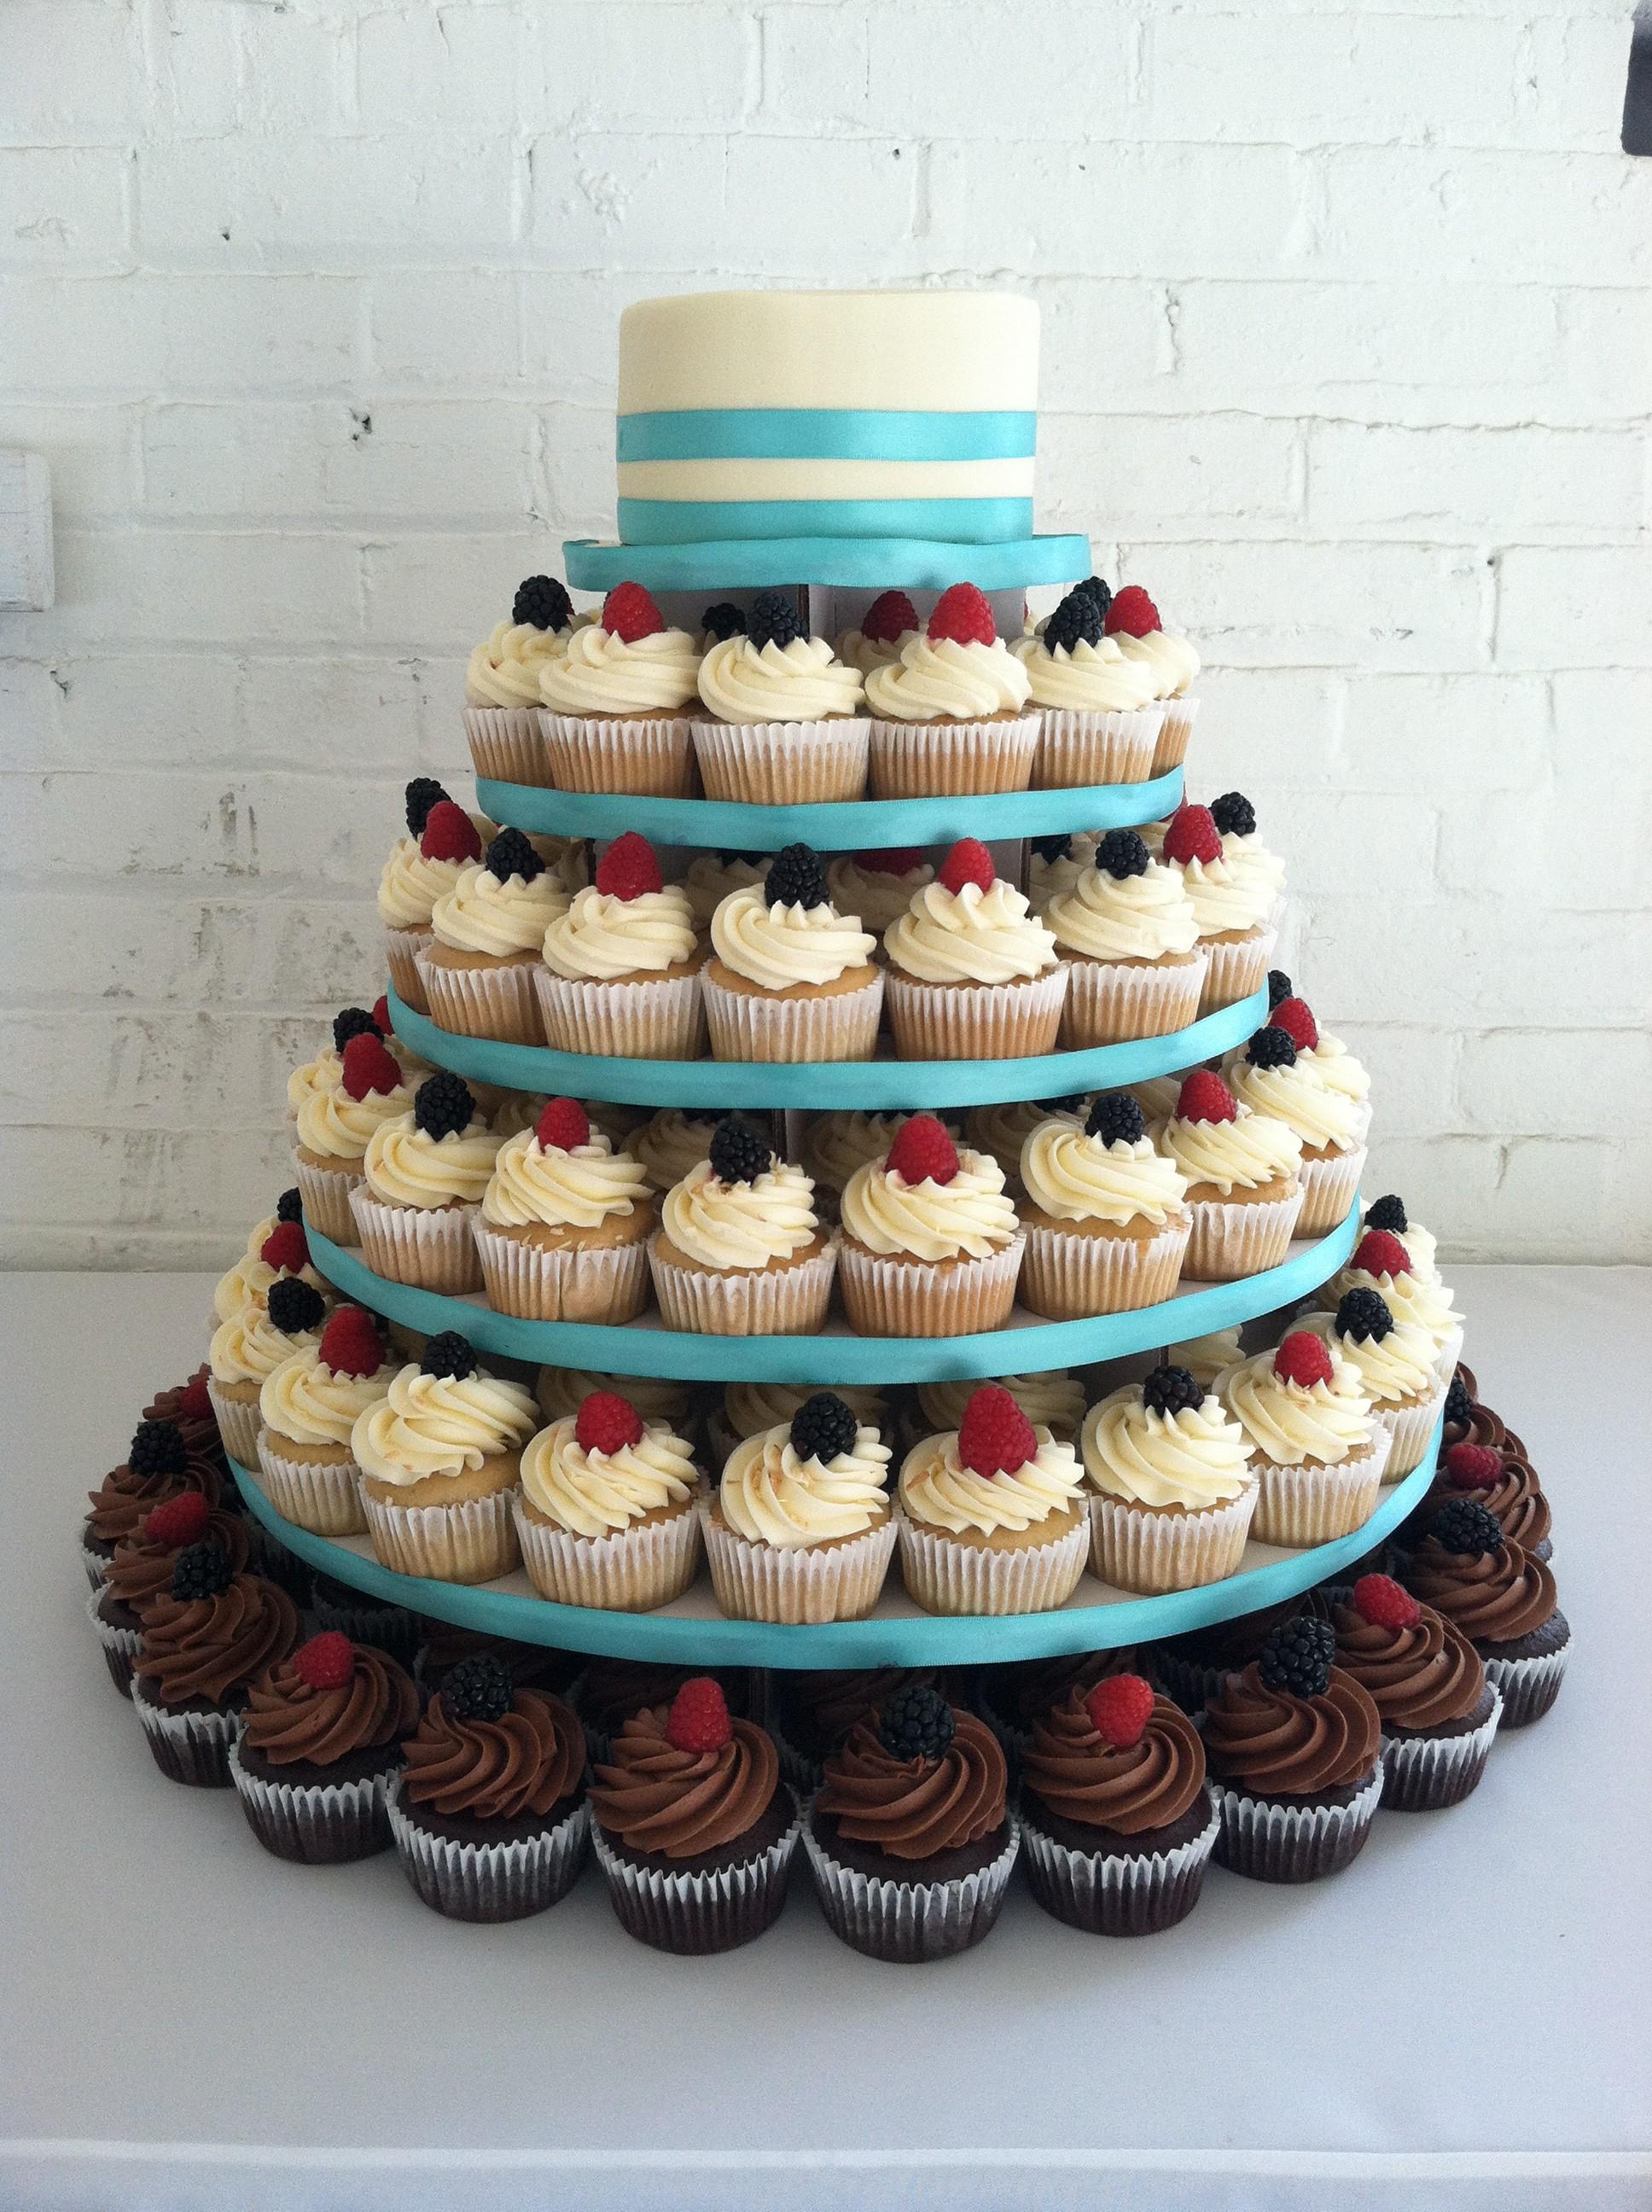 Cake Bakery Portland Bakery Chocolate Bakery Wedding Birthday Cake.  Sweetpea Baking Company